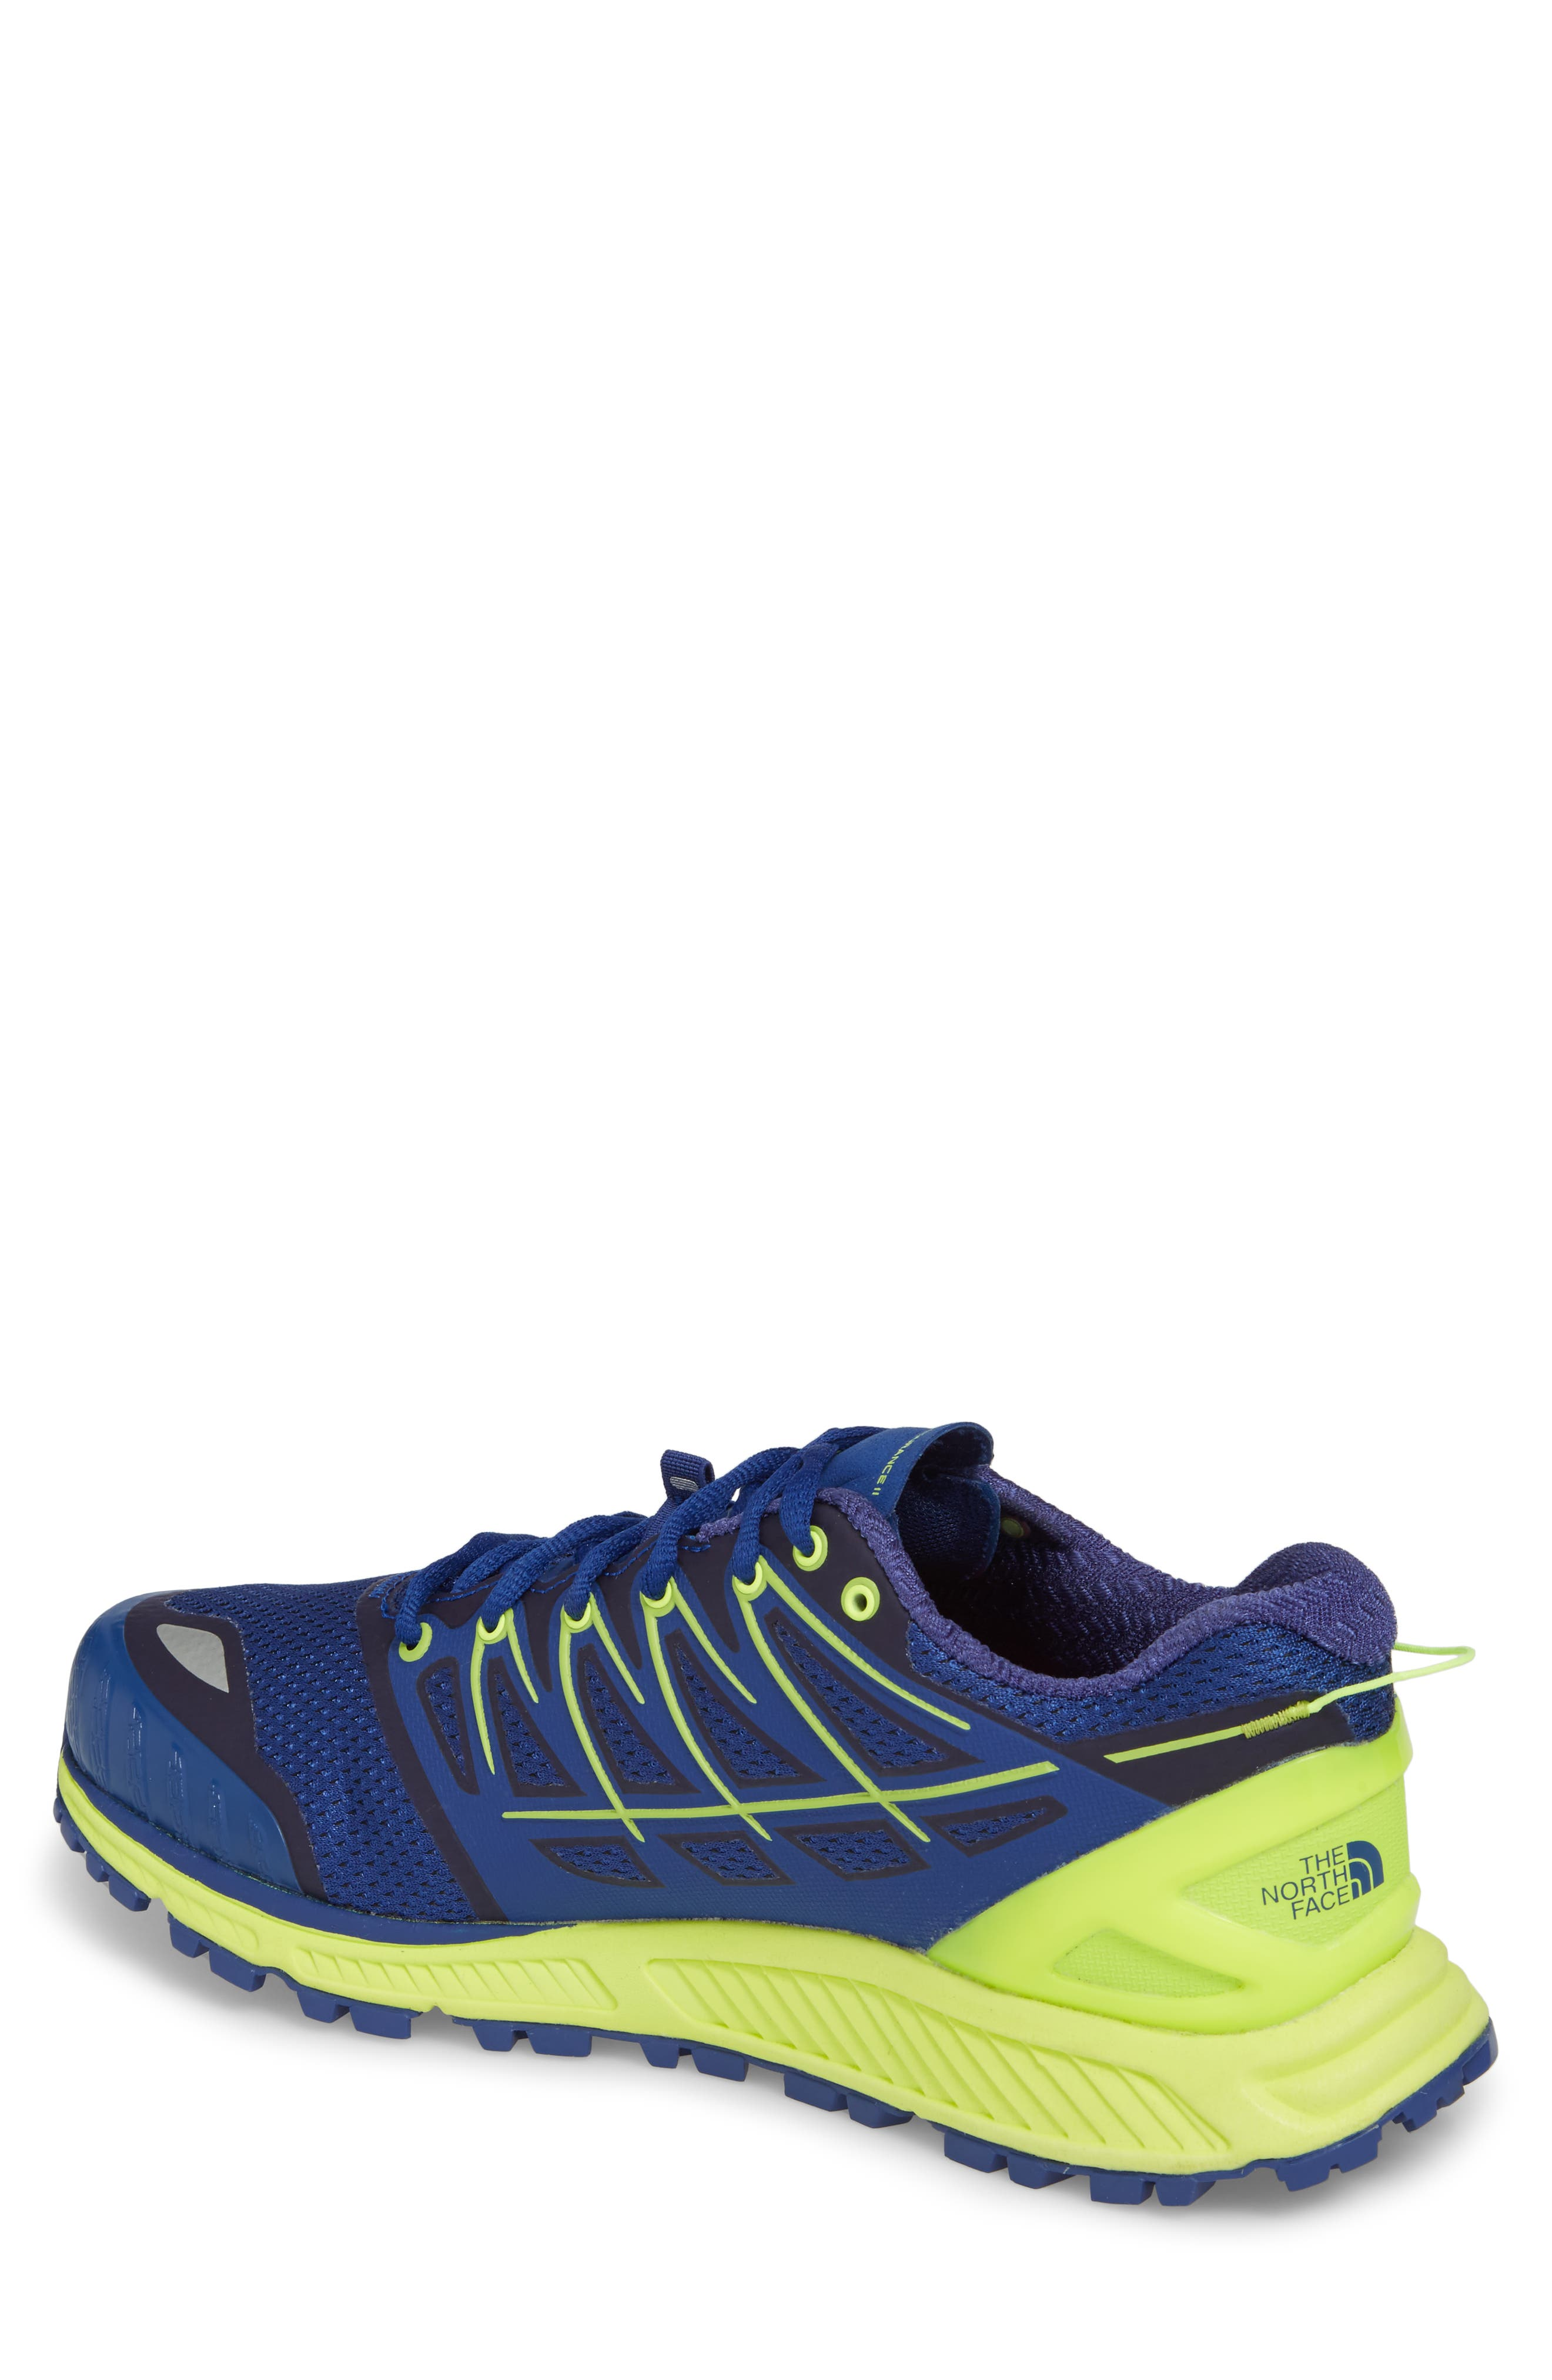 Ultra Endurance II Trail Running Shoe,                             Alternate thumbnail 2, color,                             Brit Blue/ Dayglo Yellow